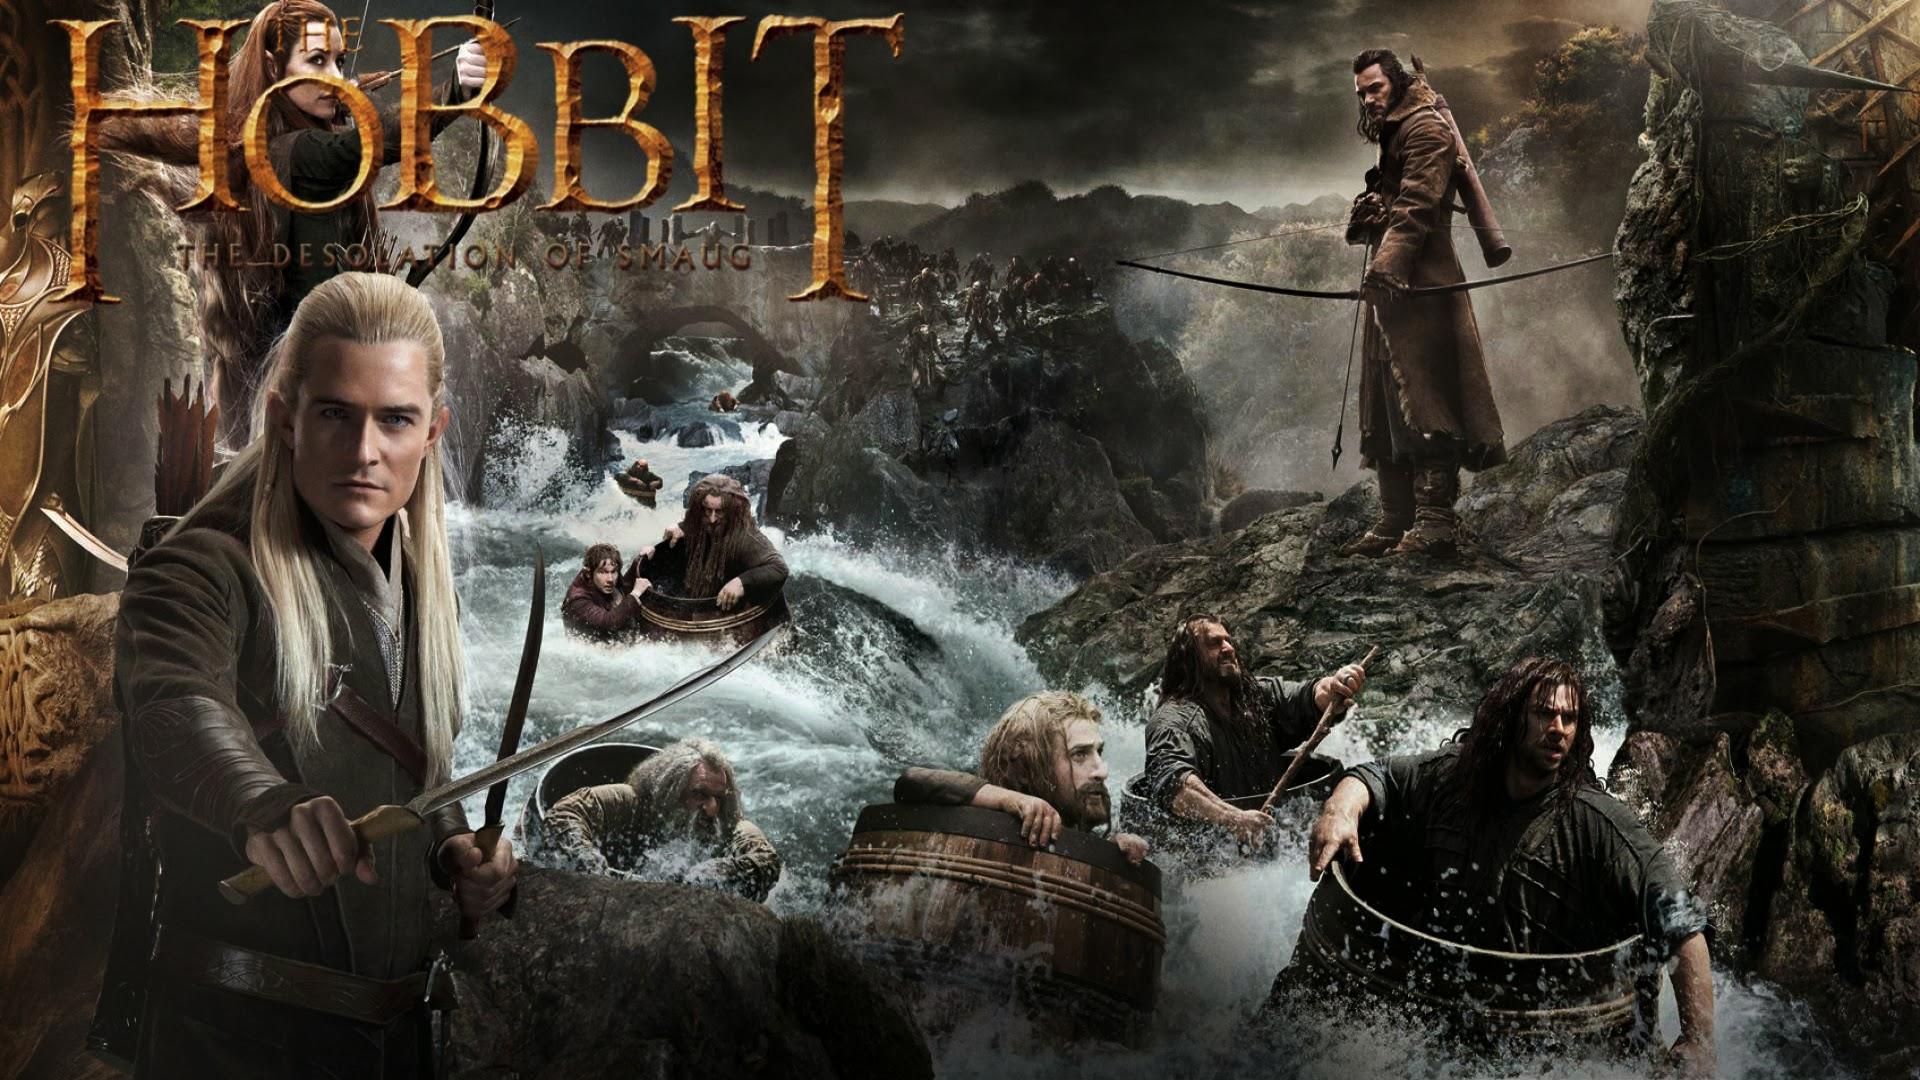 The Hobbit 2013 Wallpaper   Wallpaper High Definition High Quality 1920x1080